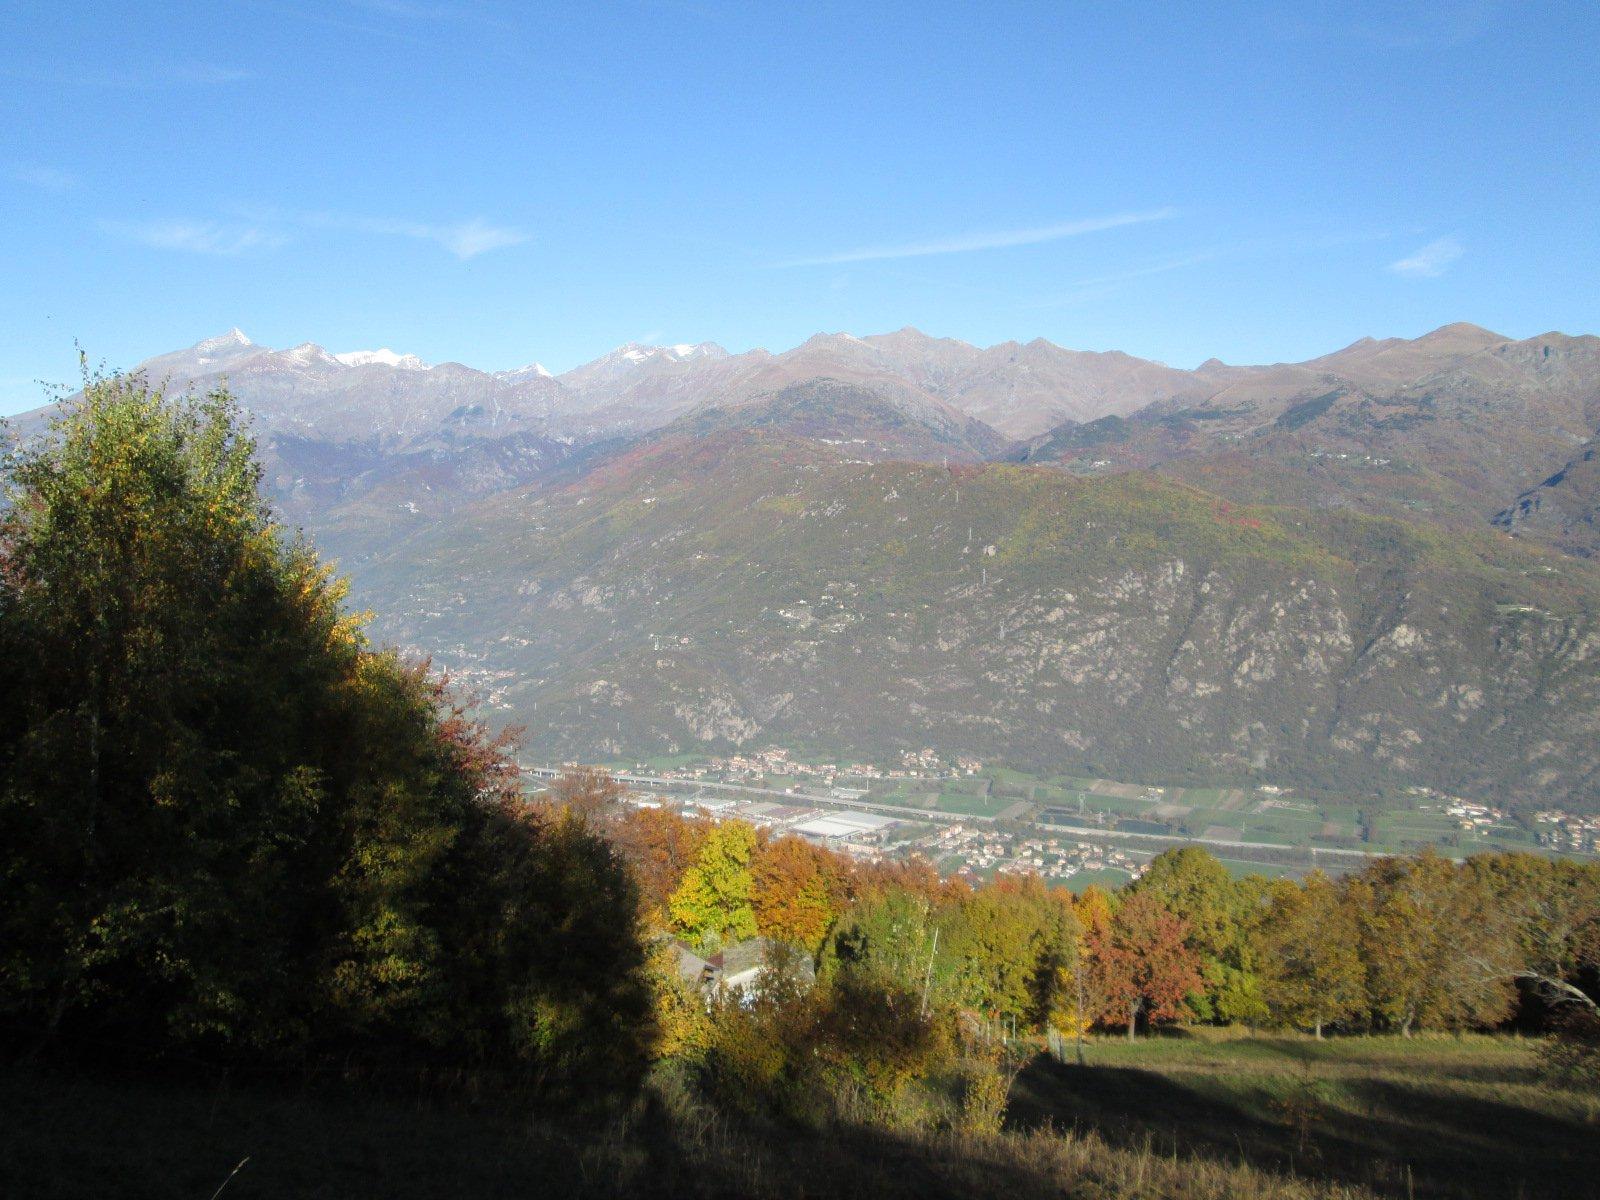 scorcio panoramico sulla valle